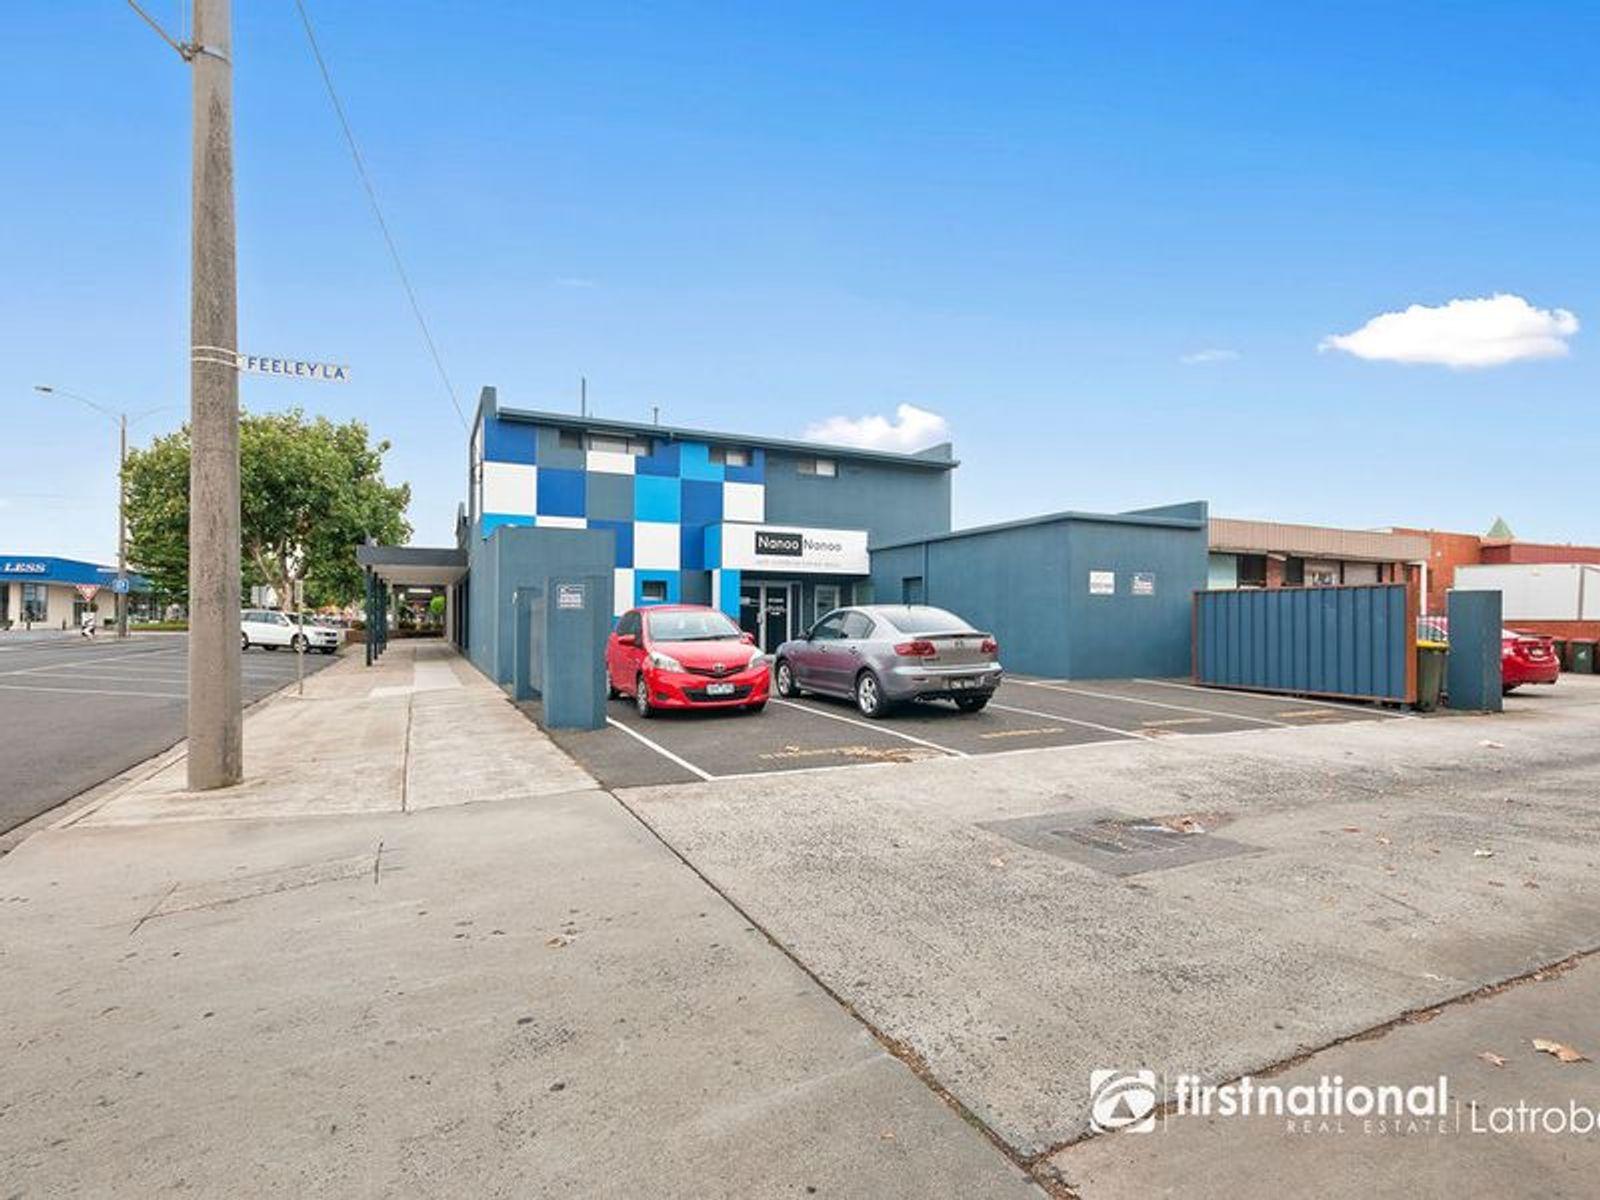 35 & 35A Church Street & 107 & 109 Seymour Street, Traralgon, VIC 3844